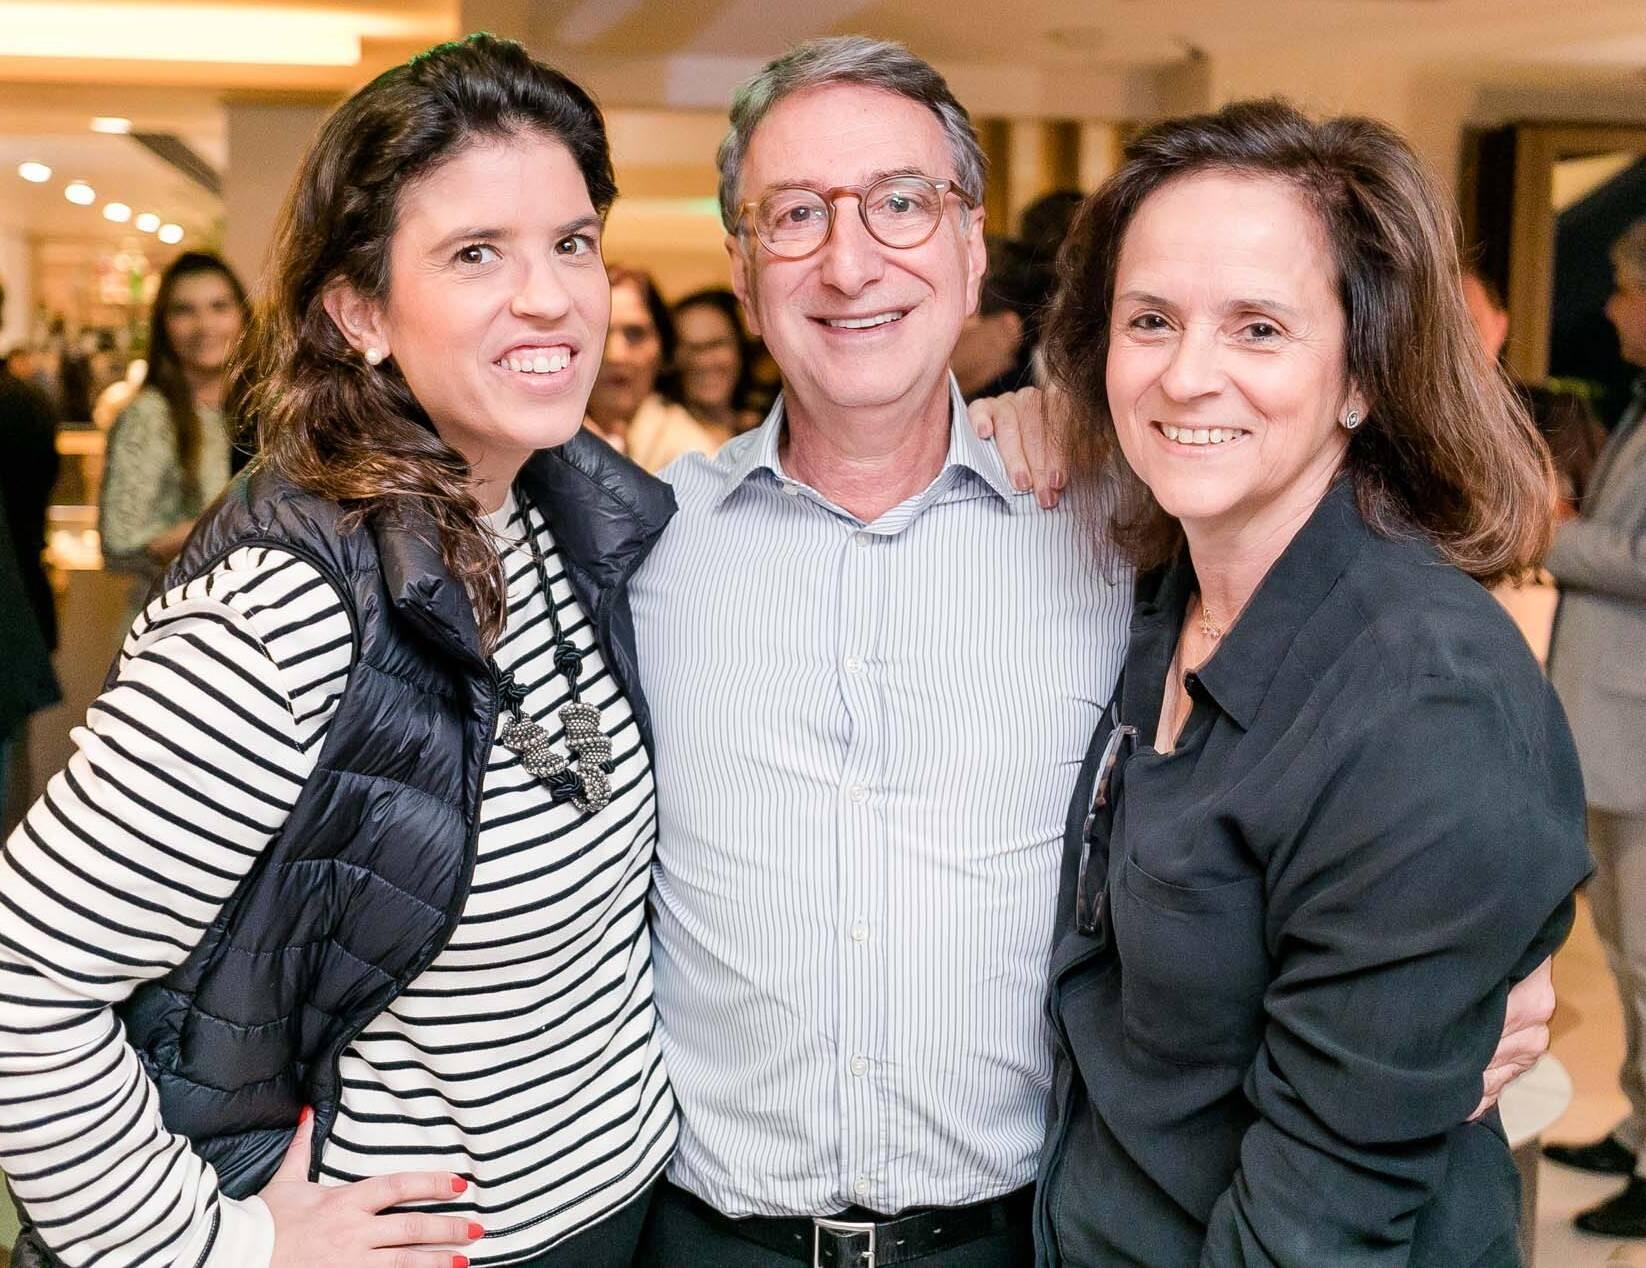 Fernanda Quentel, Salomão Crosman e Patricia Quentel /Foto: Miguel Sá